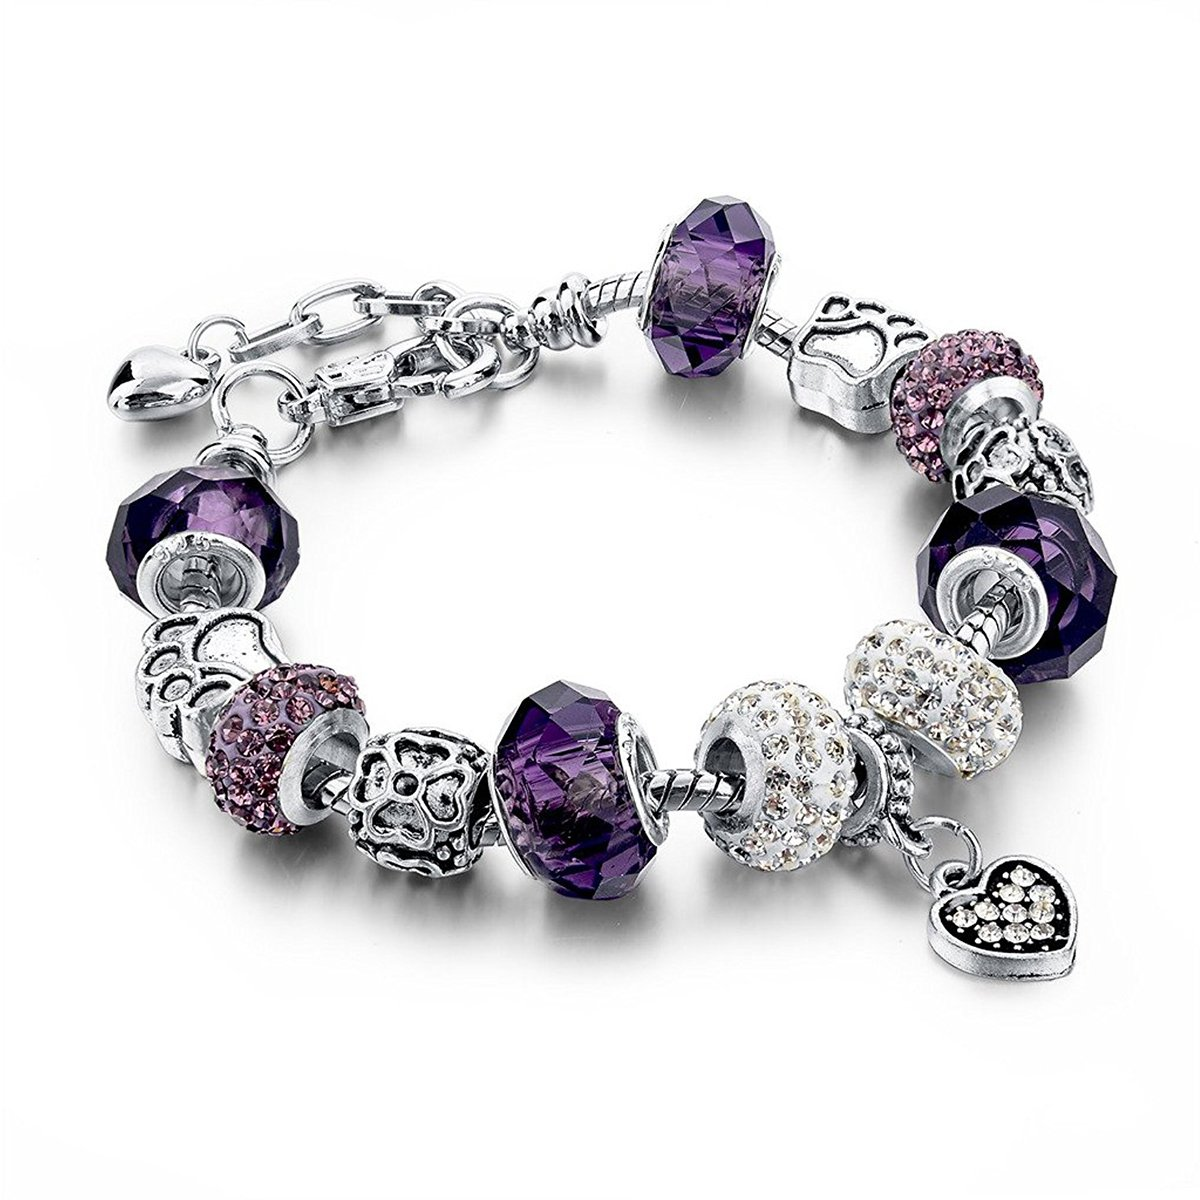 Choker Silver Plated Snake Chain Charm Bracelets Bangles Purple Murano Glass & Crystal Beads Fit Bracelet Women